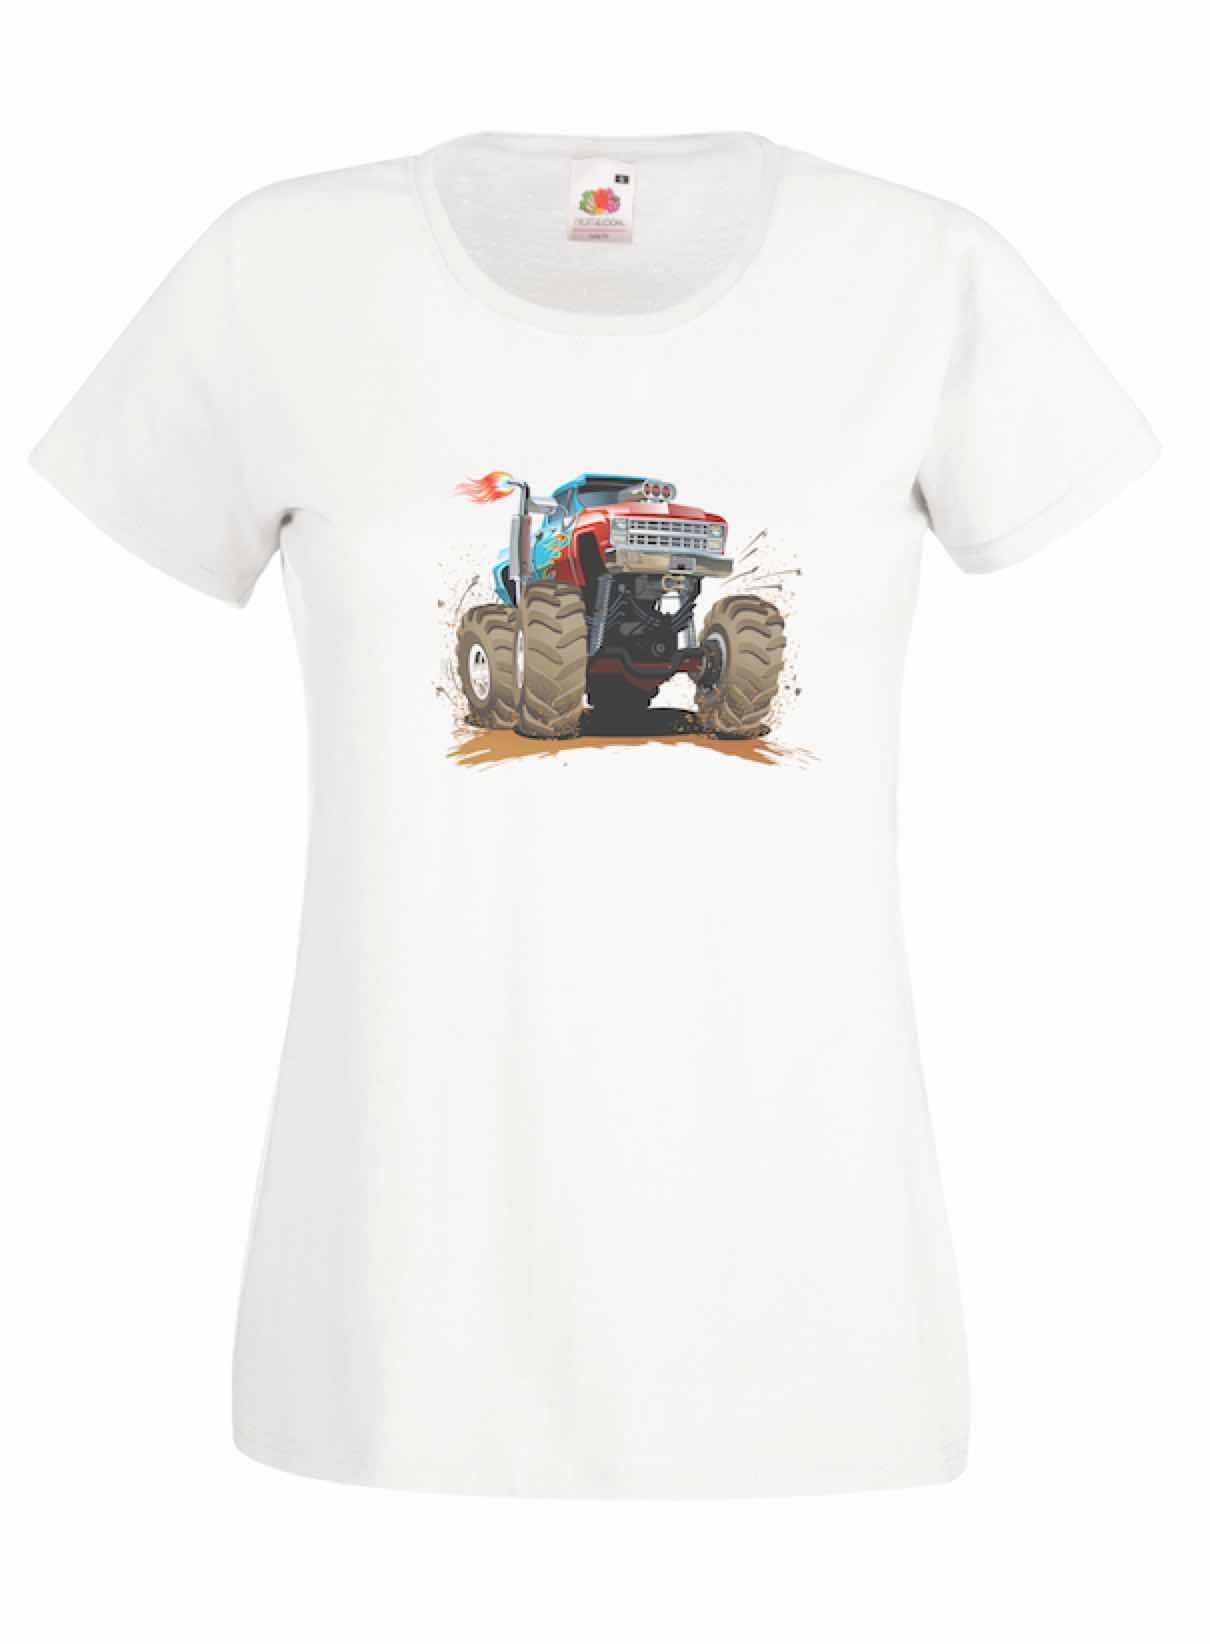 Hot Truck design for t-shirt, hoodie & sweatshirt